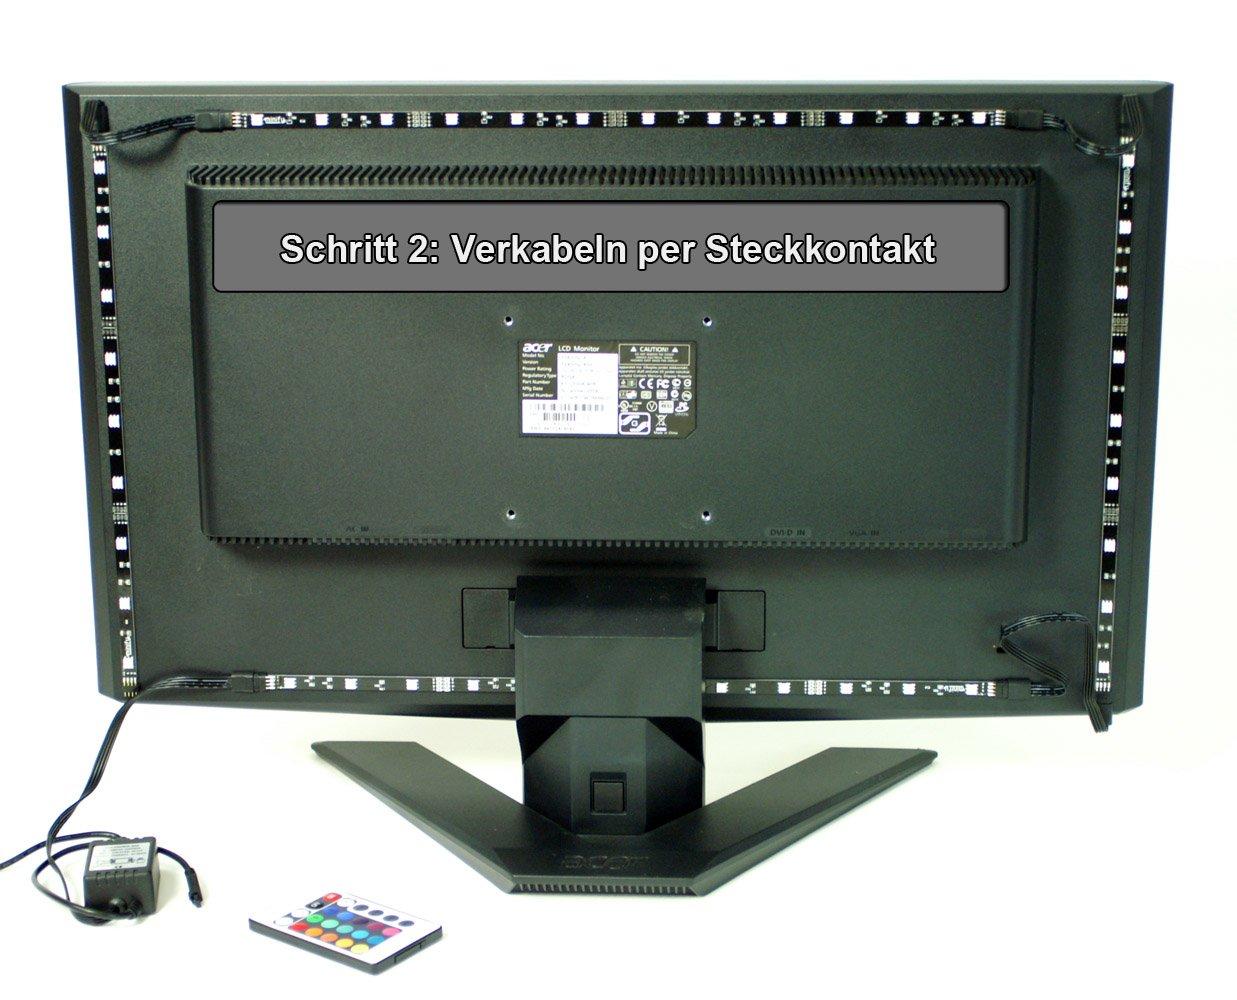 RGB TV HINTERGRUNDBELEUCHTUNG FÜR 24-42 ZOLL (61-107cm) - LED ...